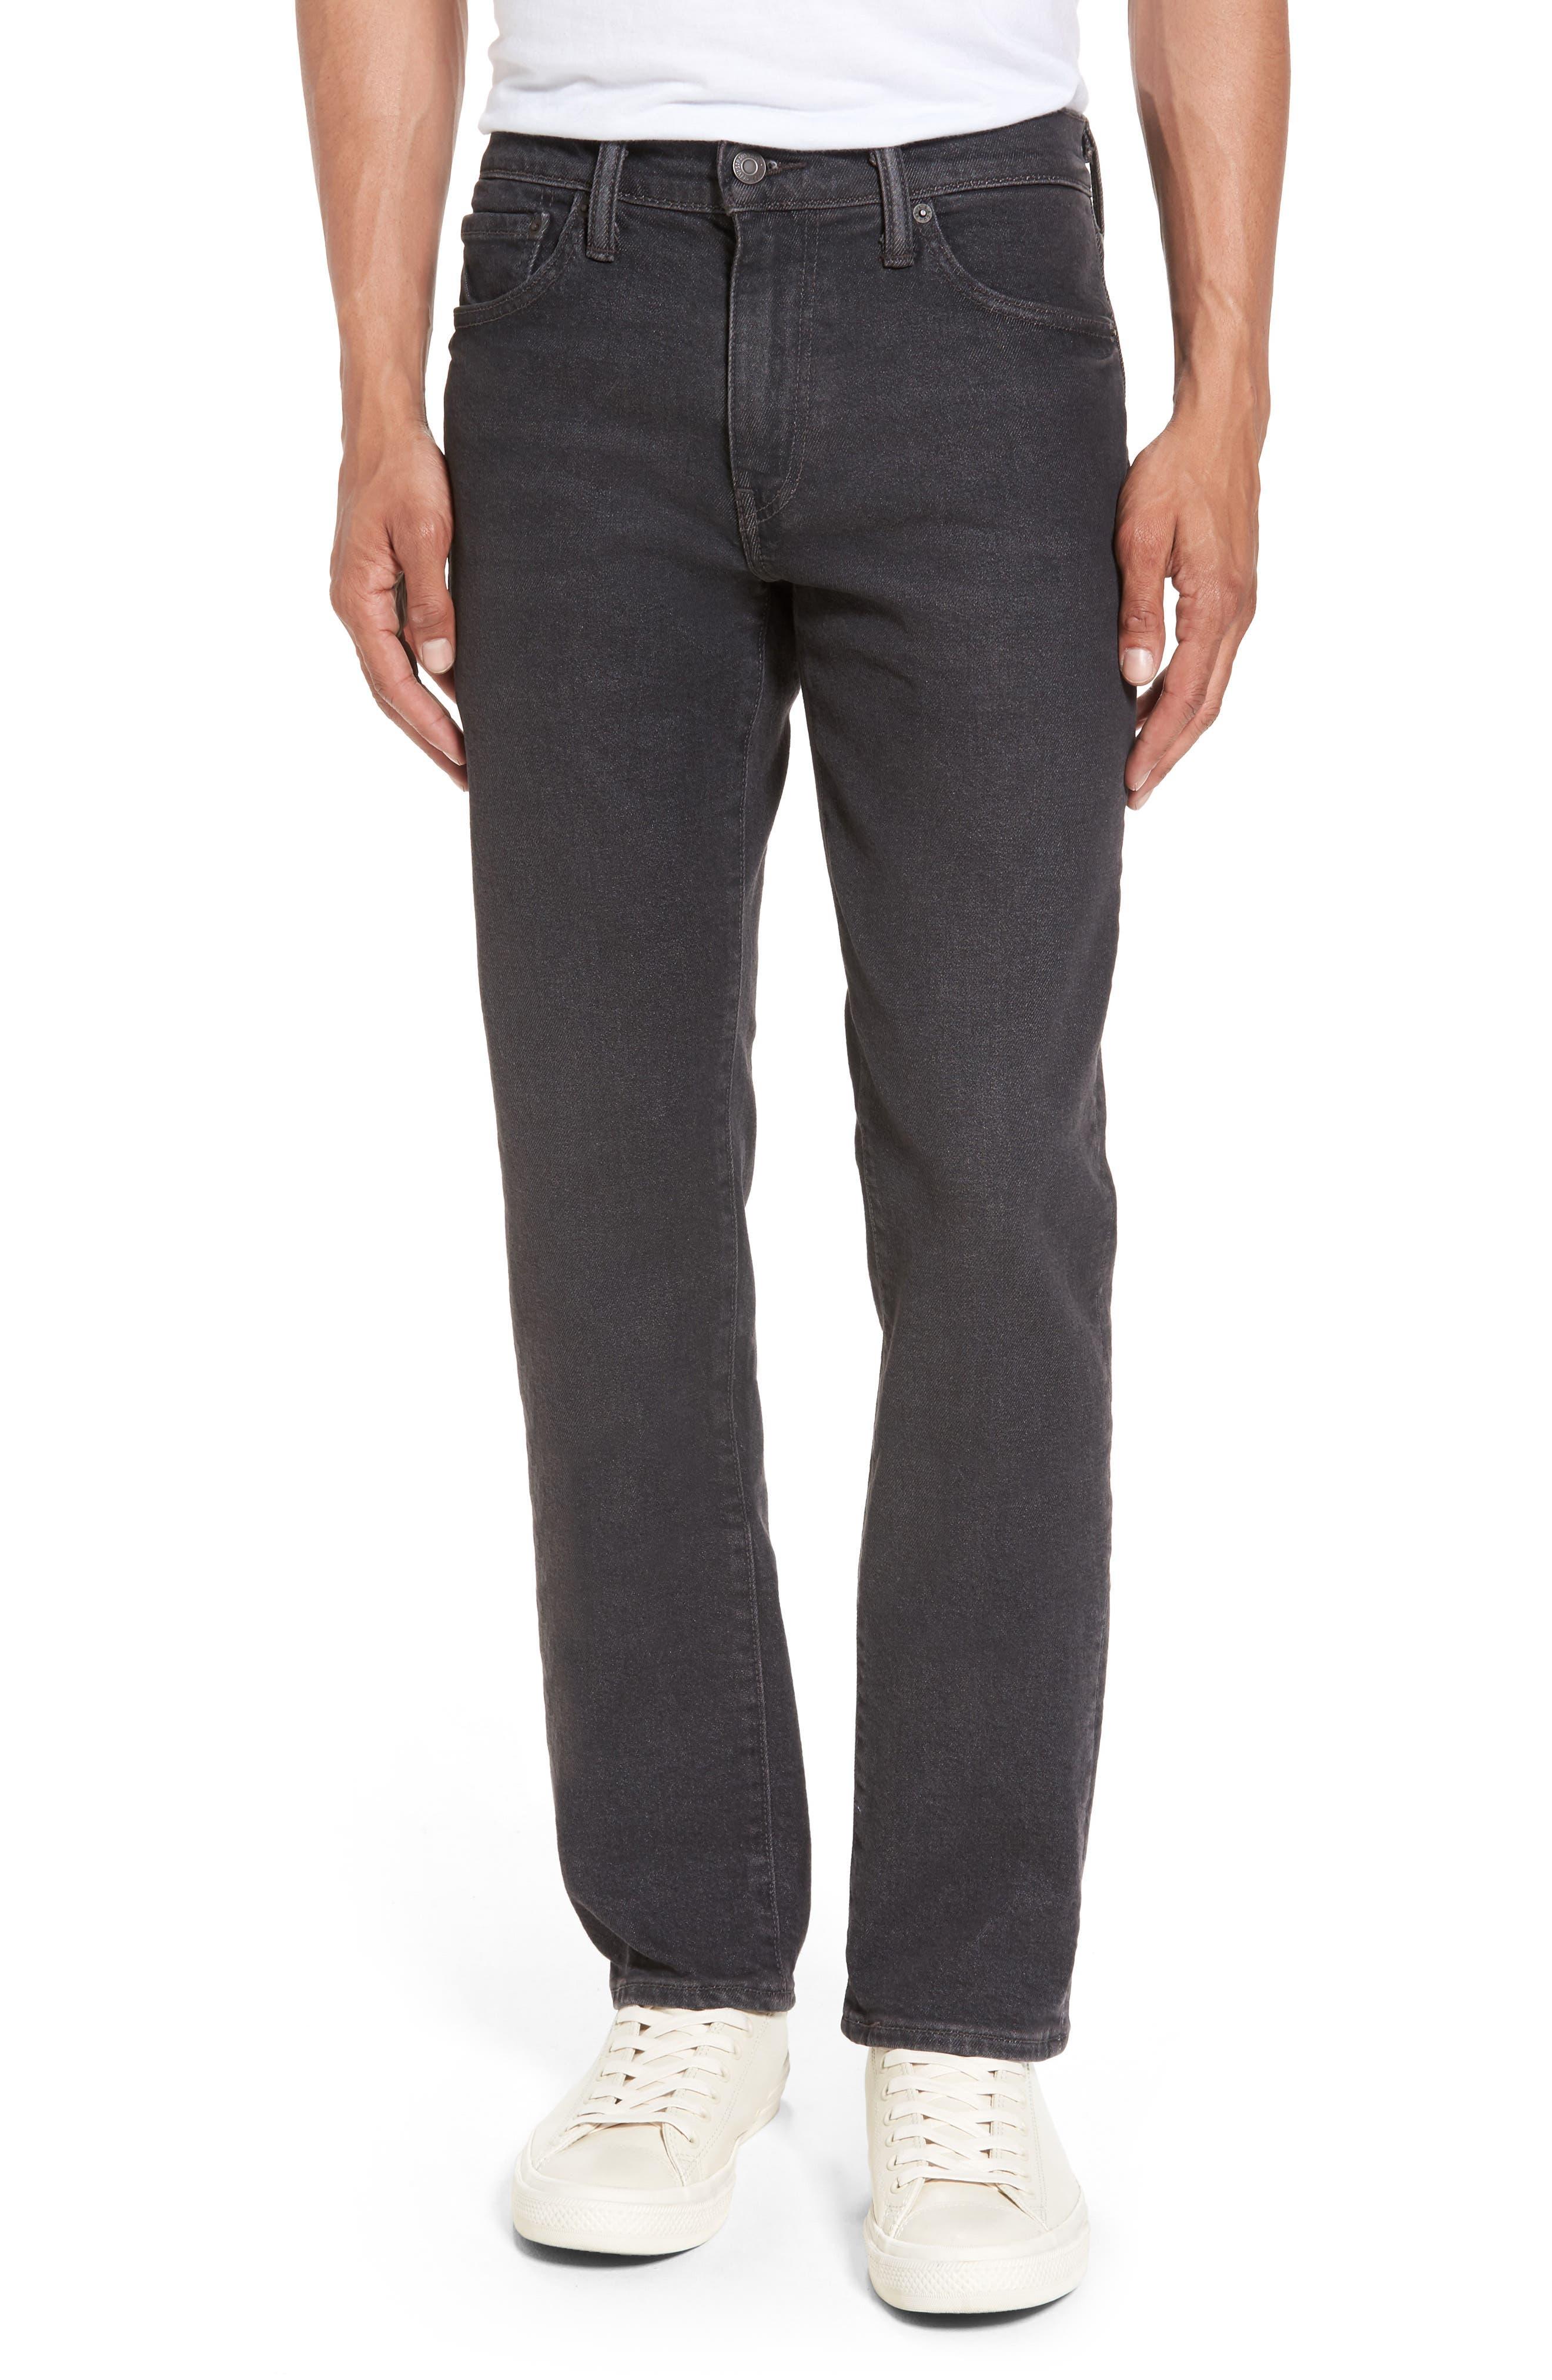 Alternate Image 1 Selected - Levi's® 511™ Slim Fit Jeans (Lorimer)